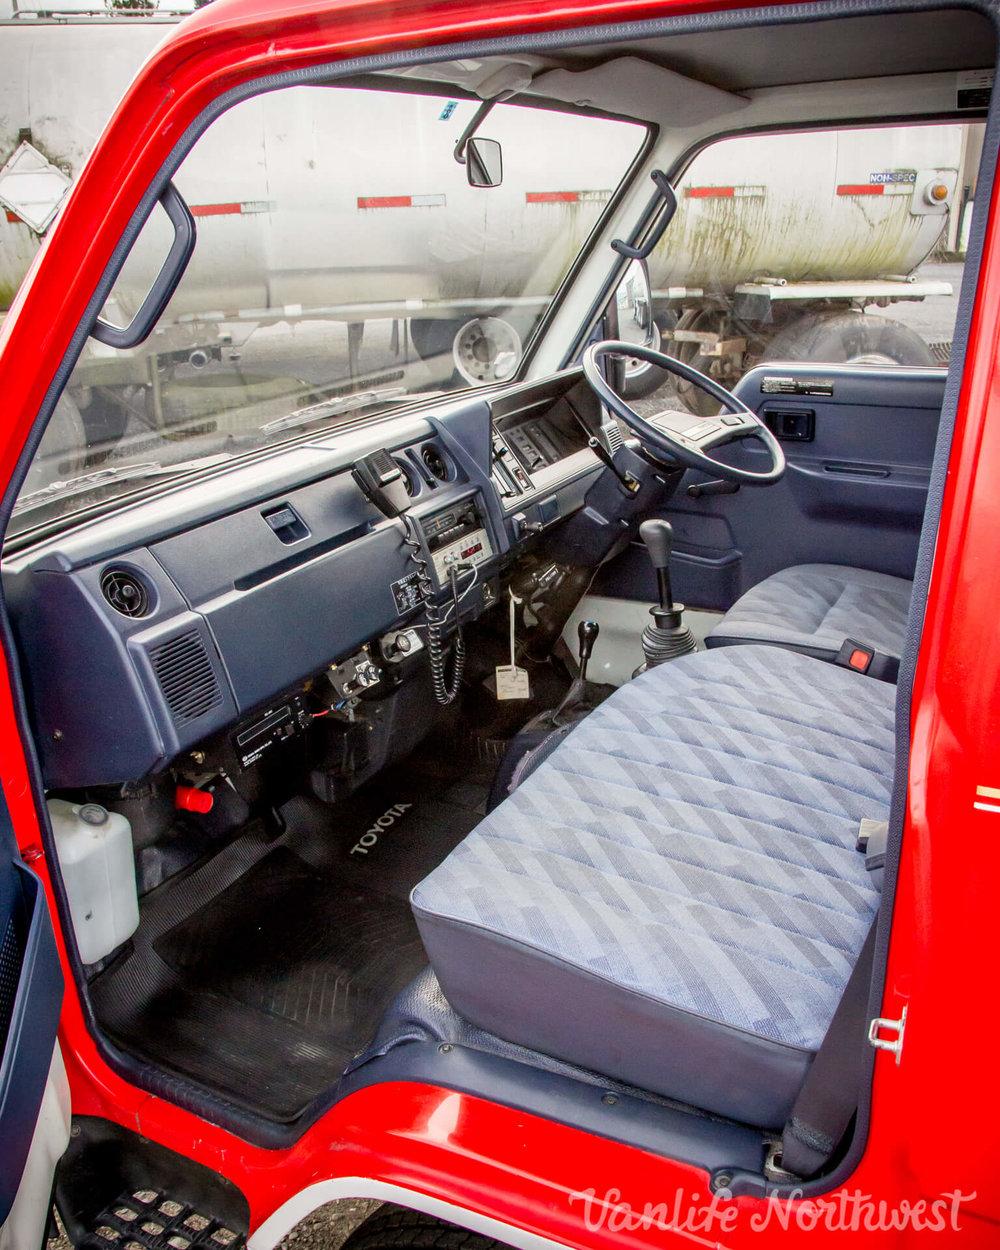 ToyotaHiaceFireTruckLH851990-24.jpg